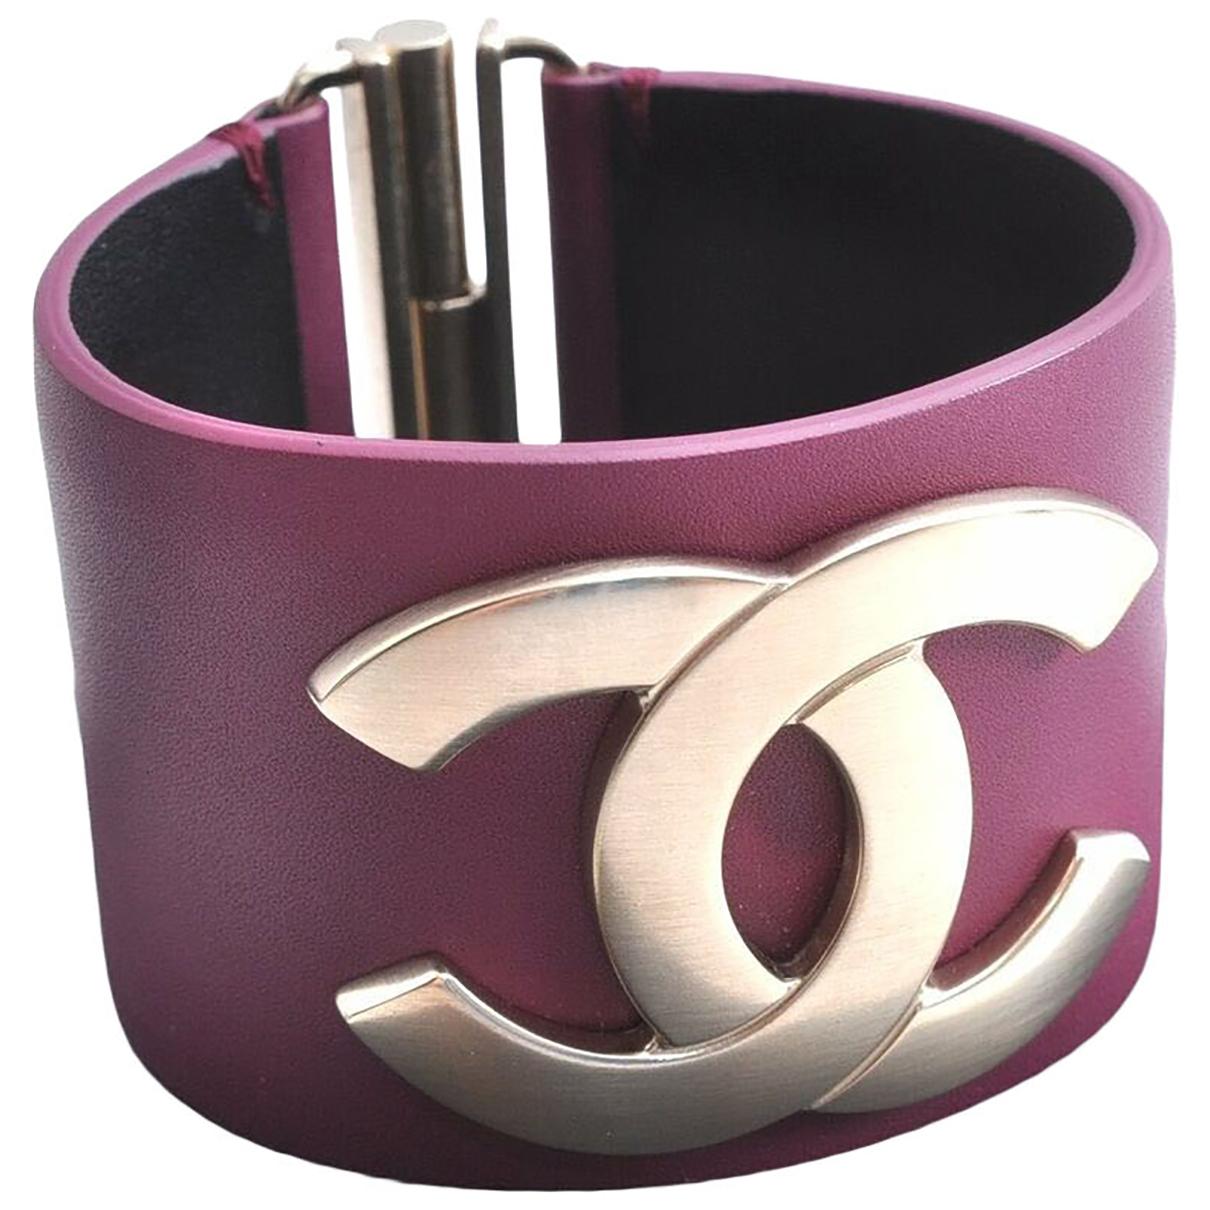 Chanel CC Armband in  Lila Leder